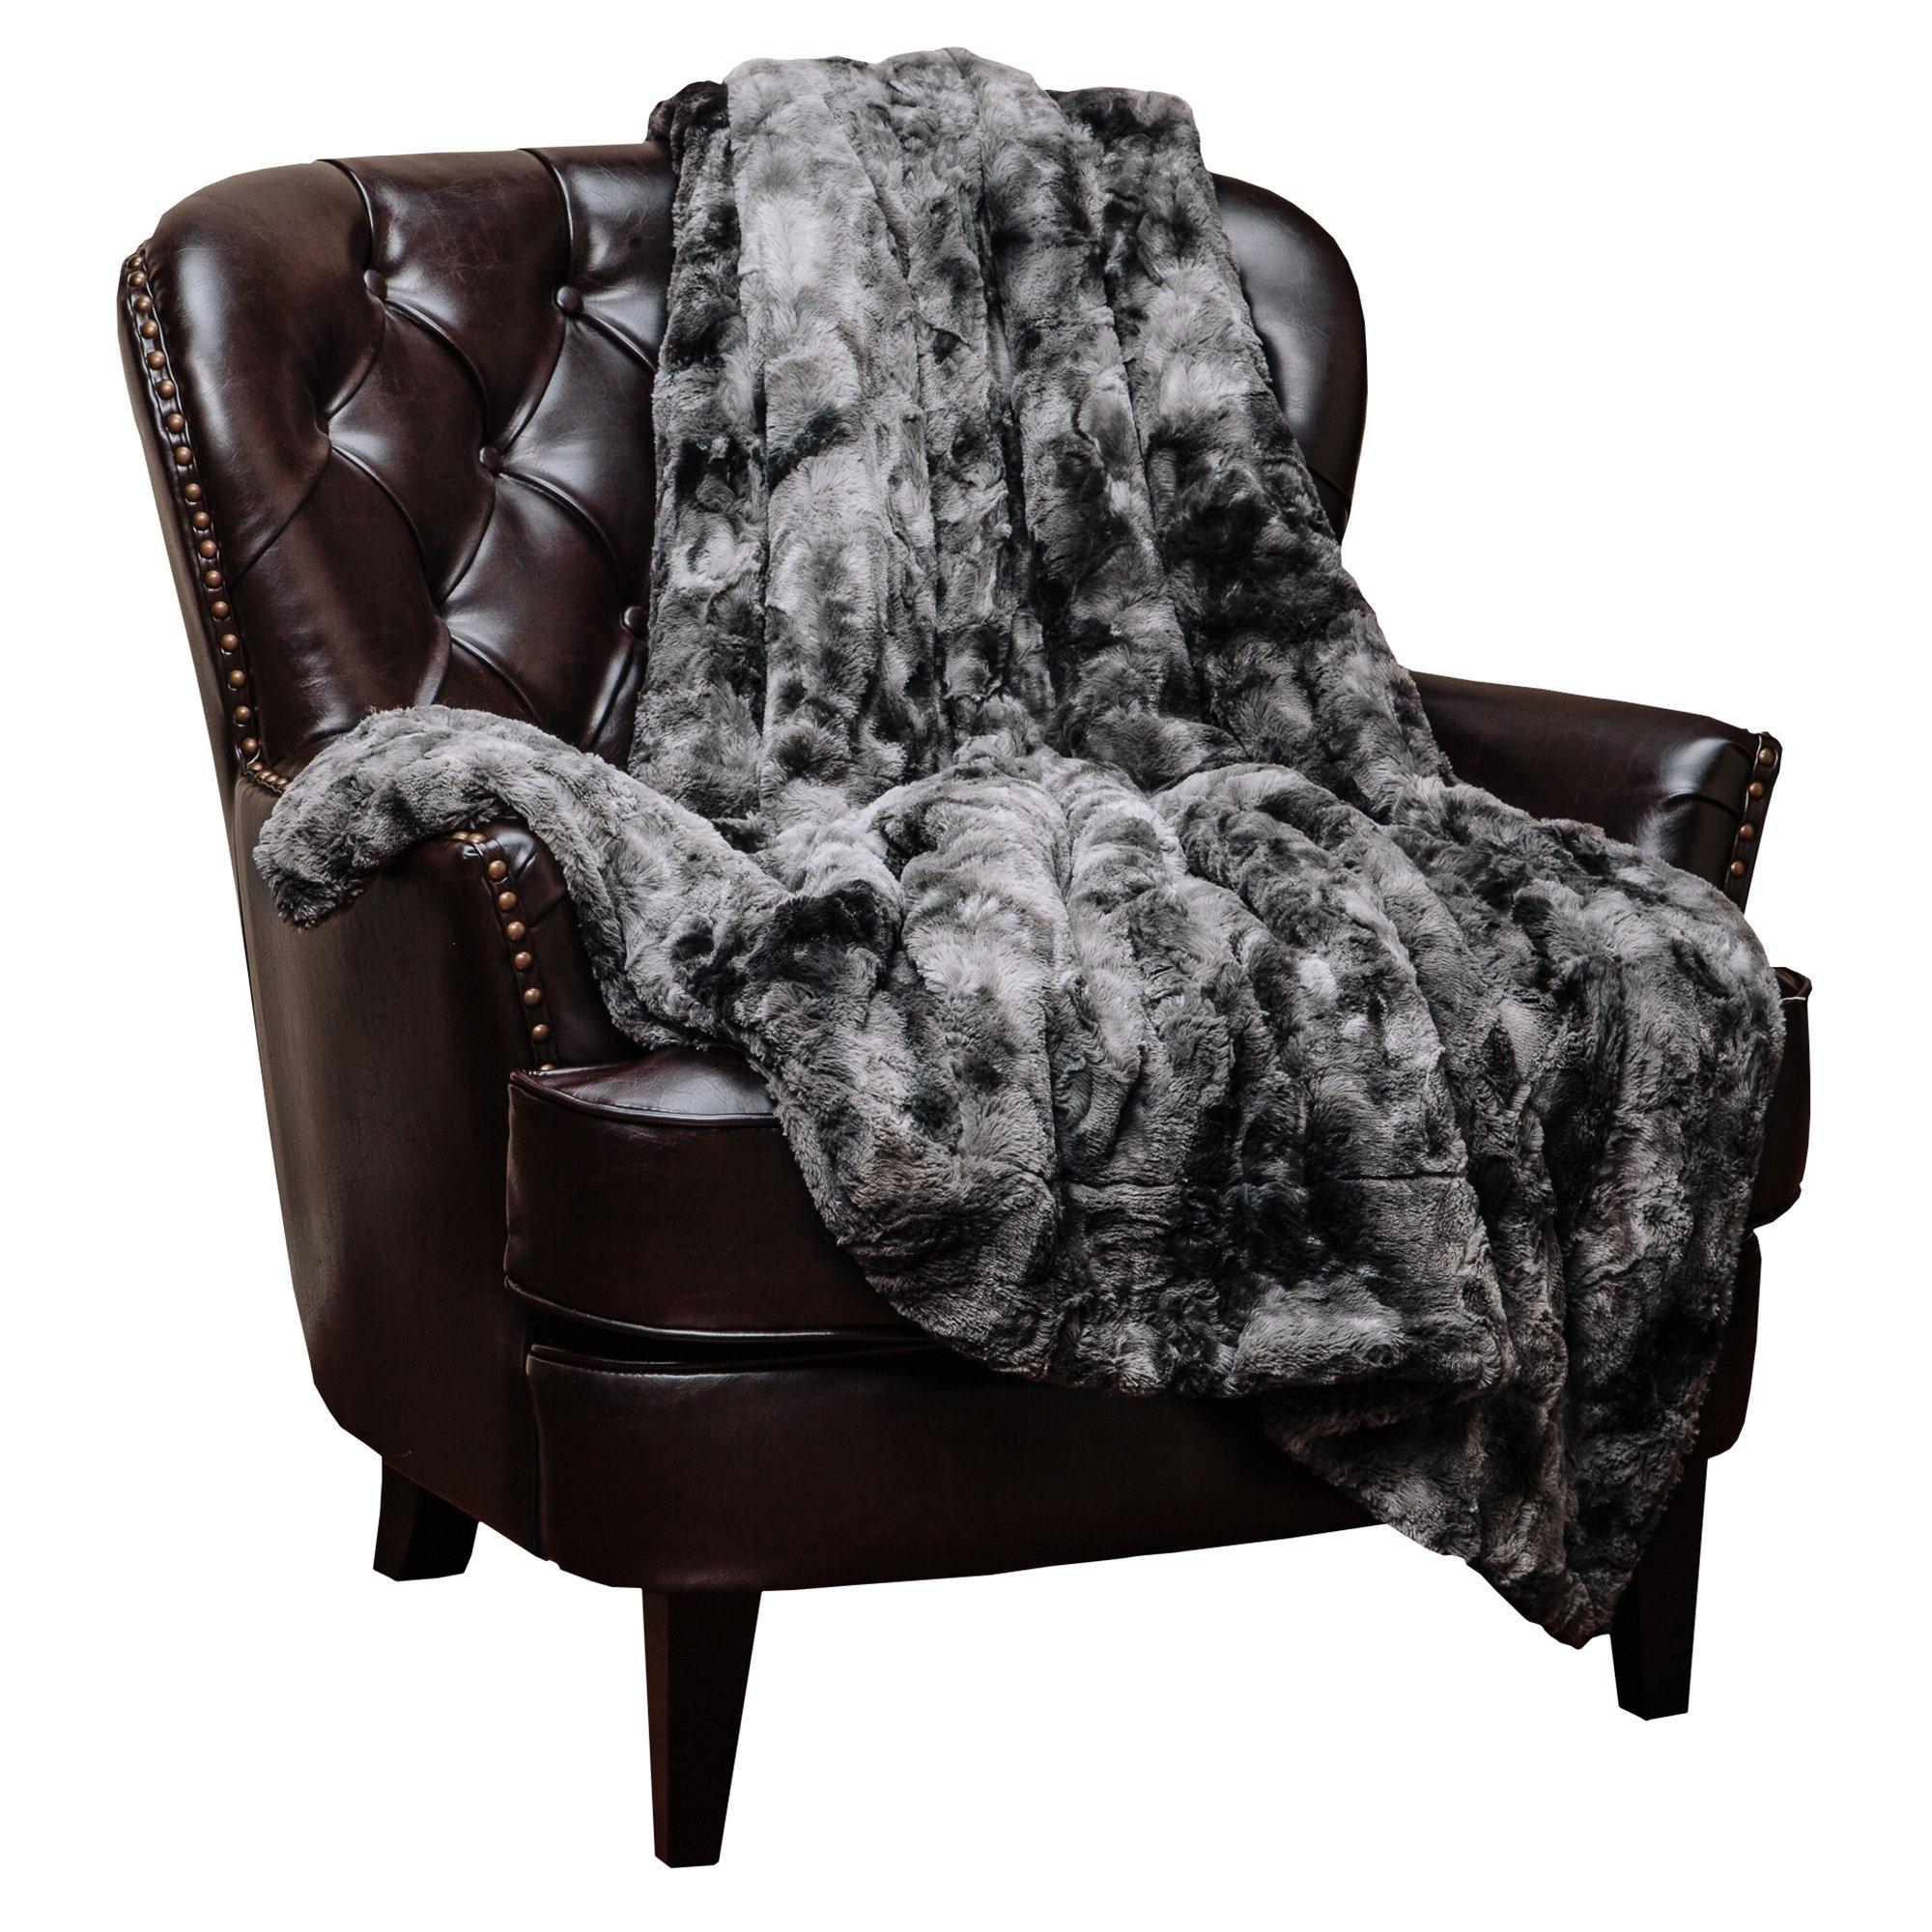 Chanasya Faux Fur Throw Blanket | Super Soft Fuzzy Light Weight Luxurious Cozy Warm Fluffy Plush Hypoallergenic Blanket for Bed Couch Chair Fall Winter Spring Living Room (50 x 65) - Dark Grey by Chanasya